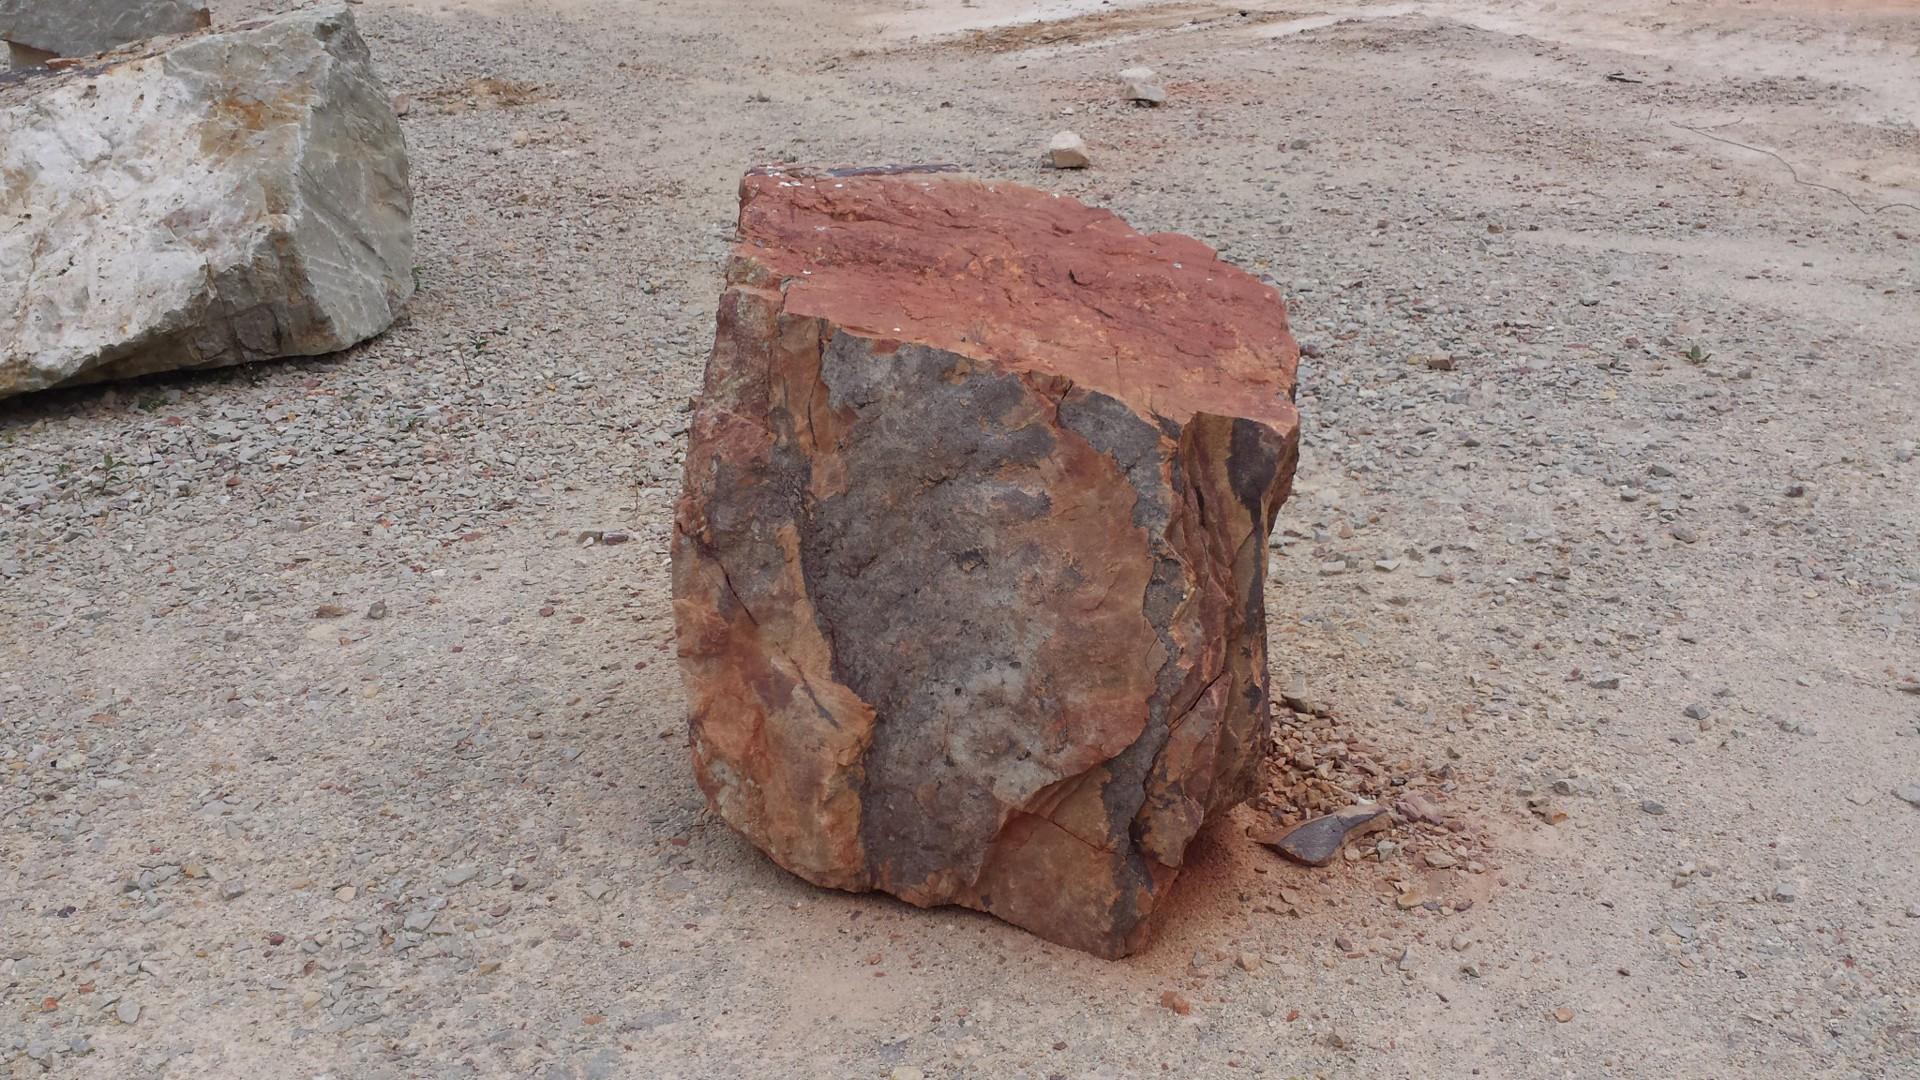 Sandkopf-017.jpg